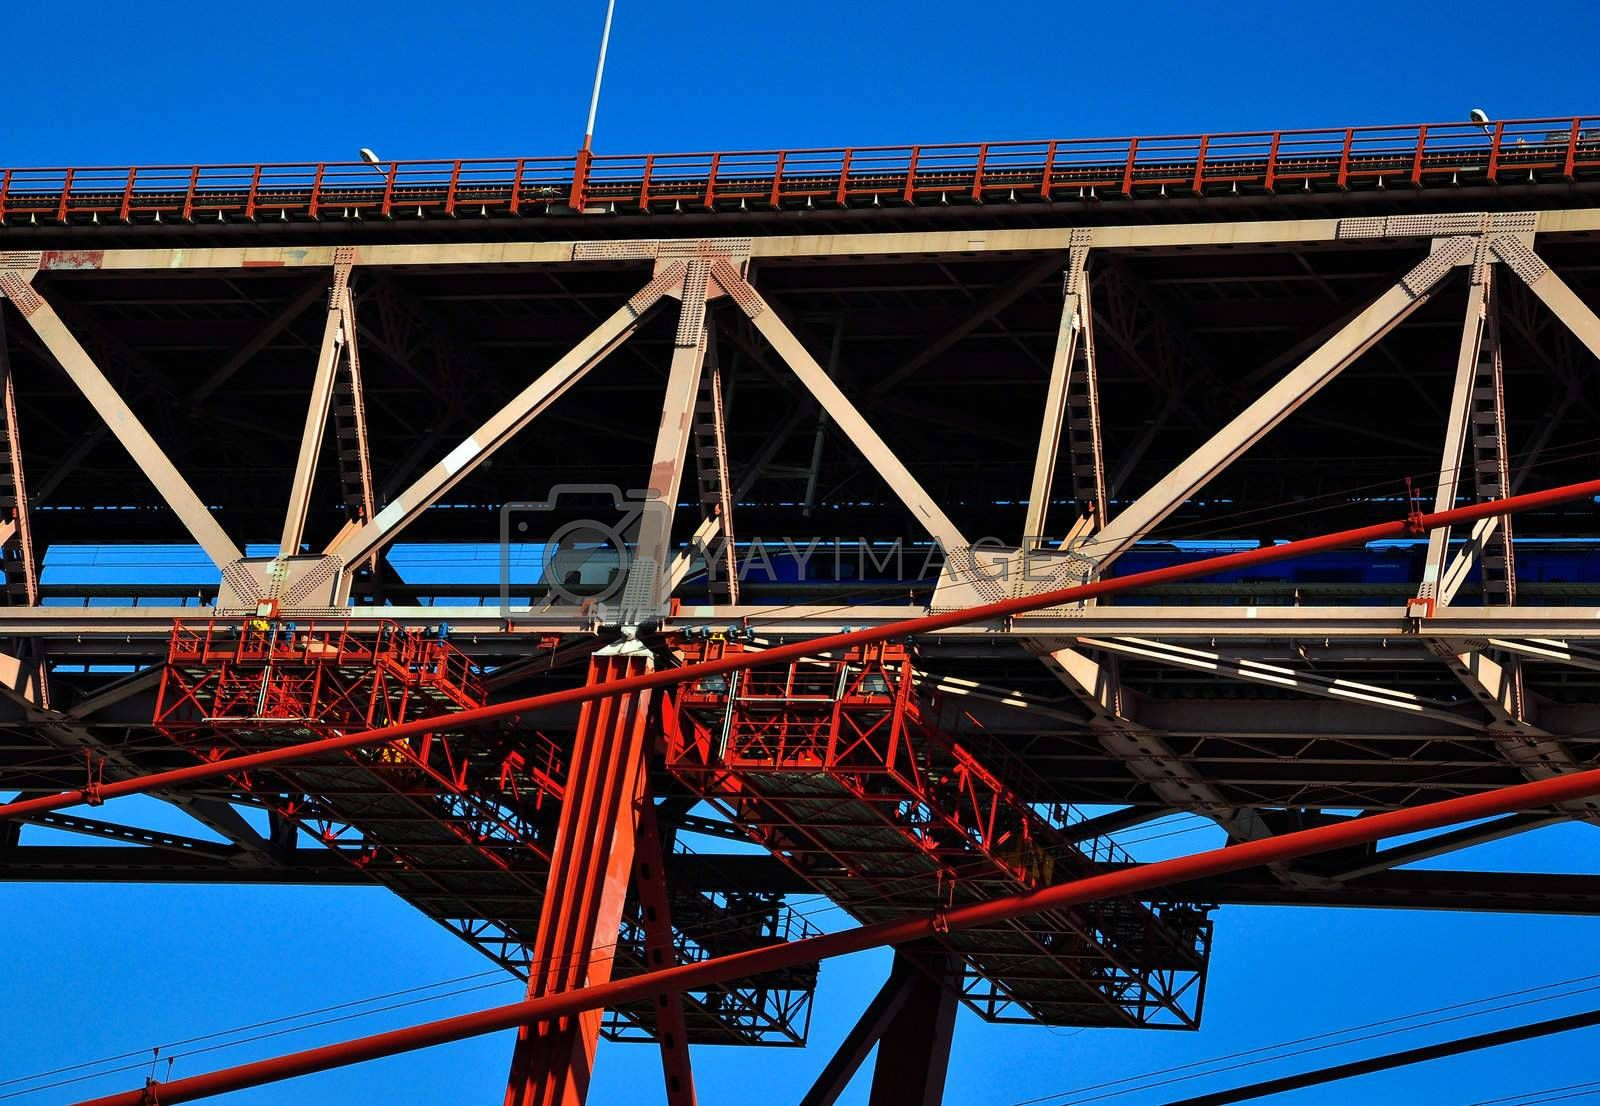 Rail-road 2 storey bridge over the River Tejo